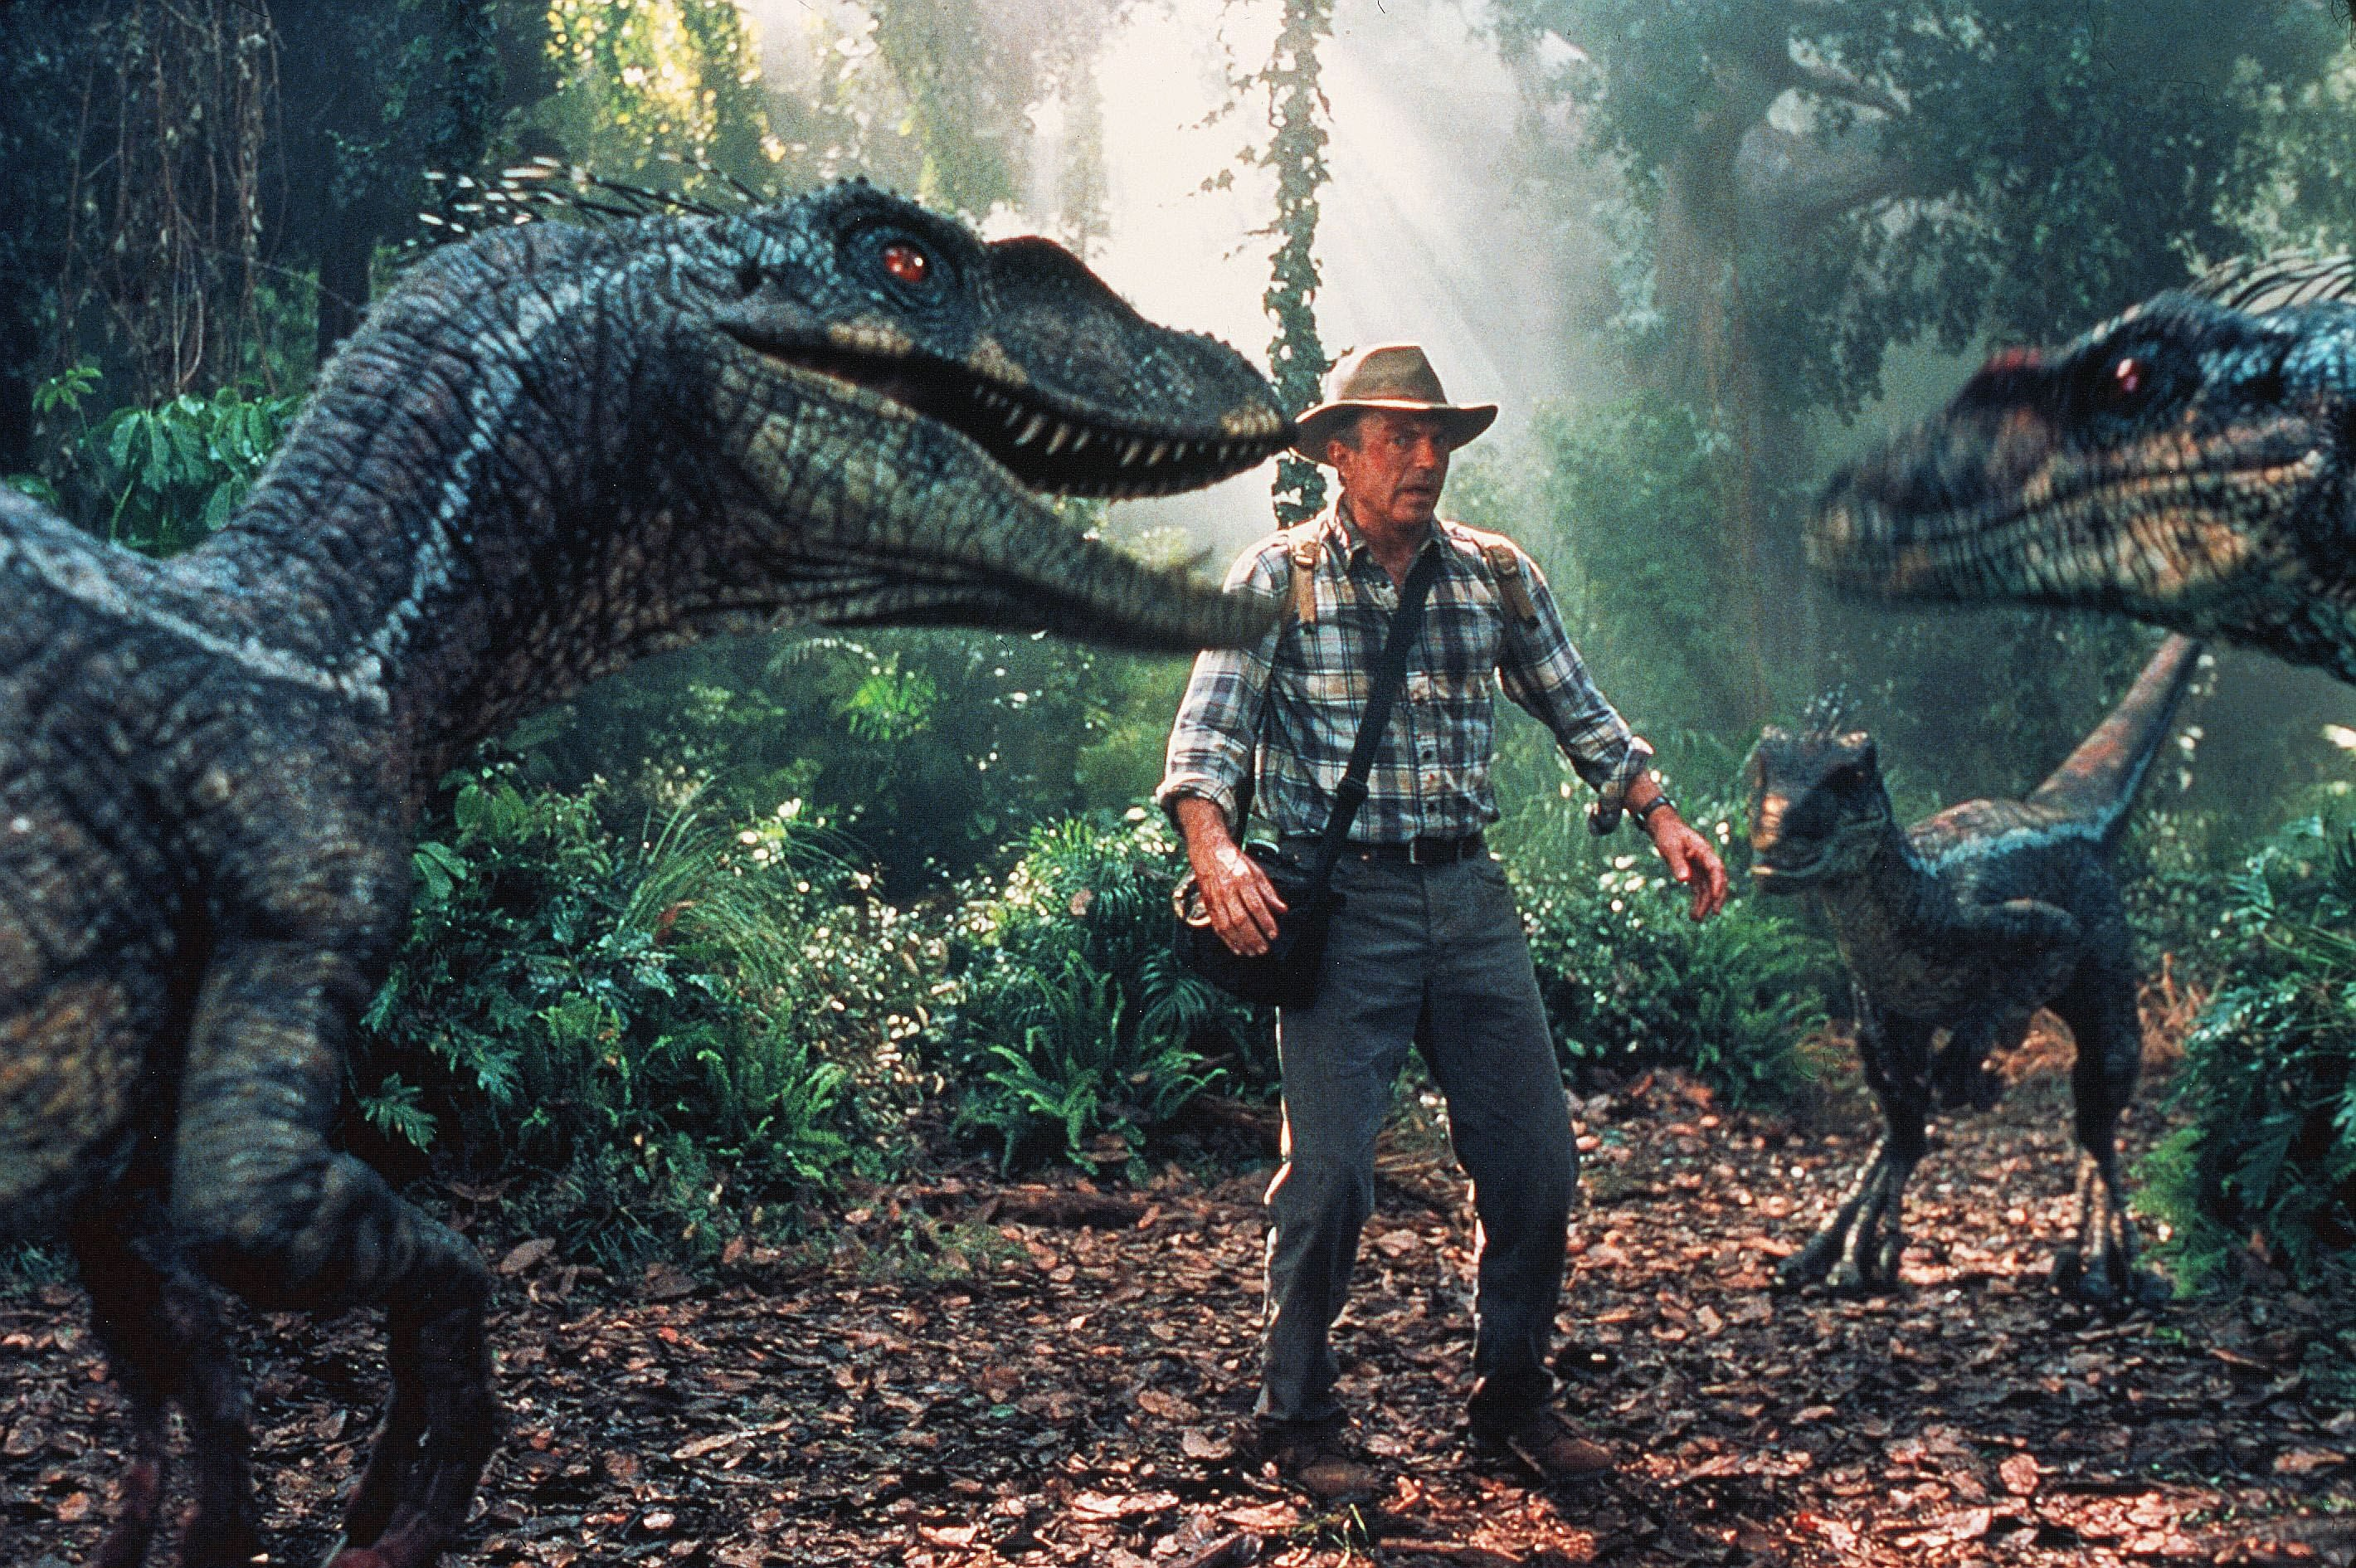 Editorial use only. No book cover usage. Mandatory Credit: Photo by ILM/Amblin/Universal/Kobal/Shutterstock (5879920f) Sam Neill Jurassic Park III - 2001 Director: Joe Johnston Amblin/Universal USA Scene Still Scifi Jurassic Park 3